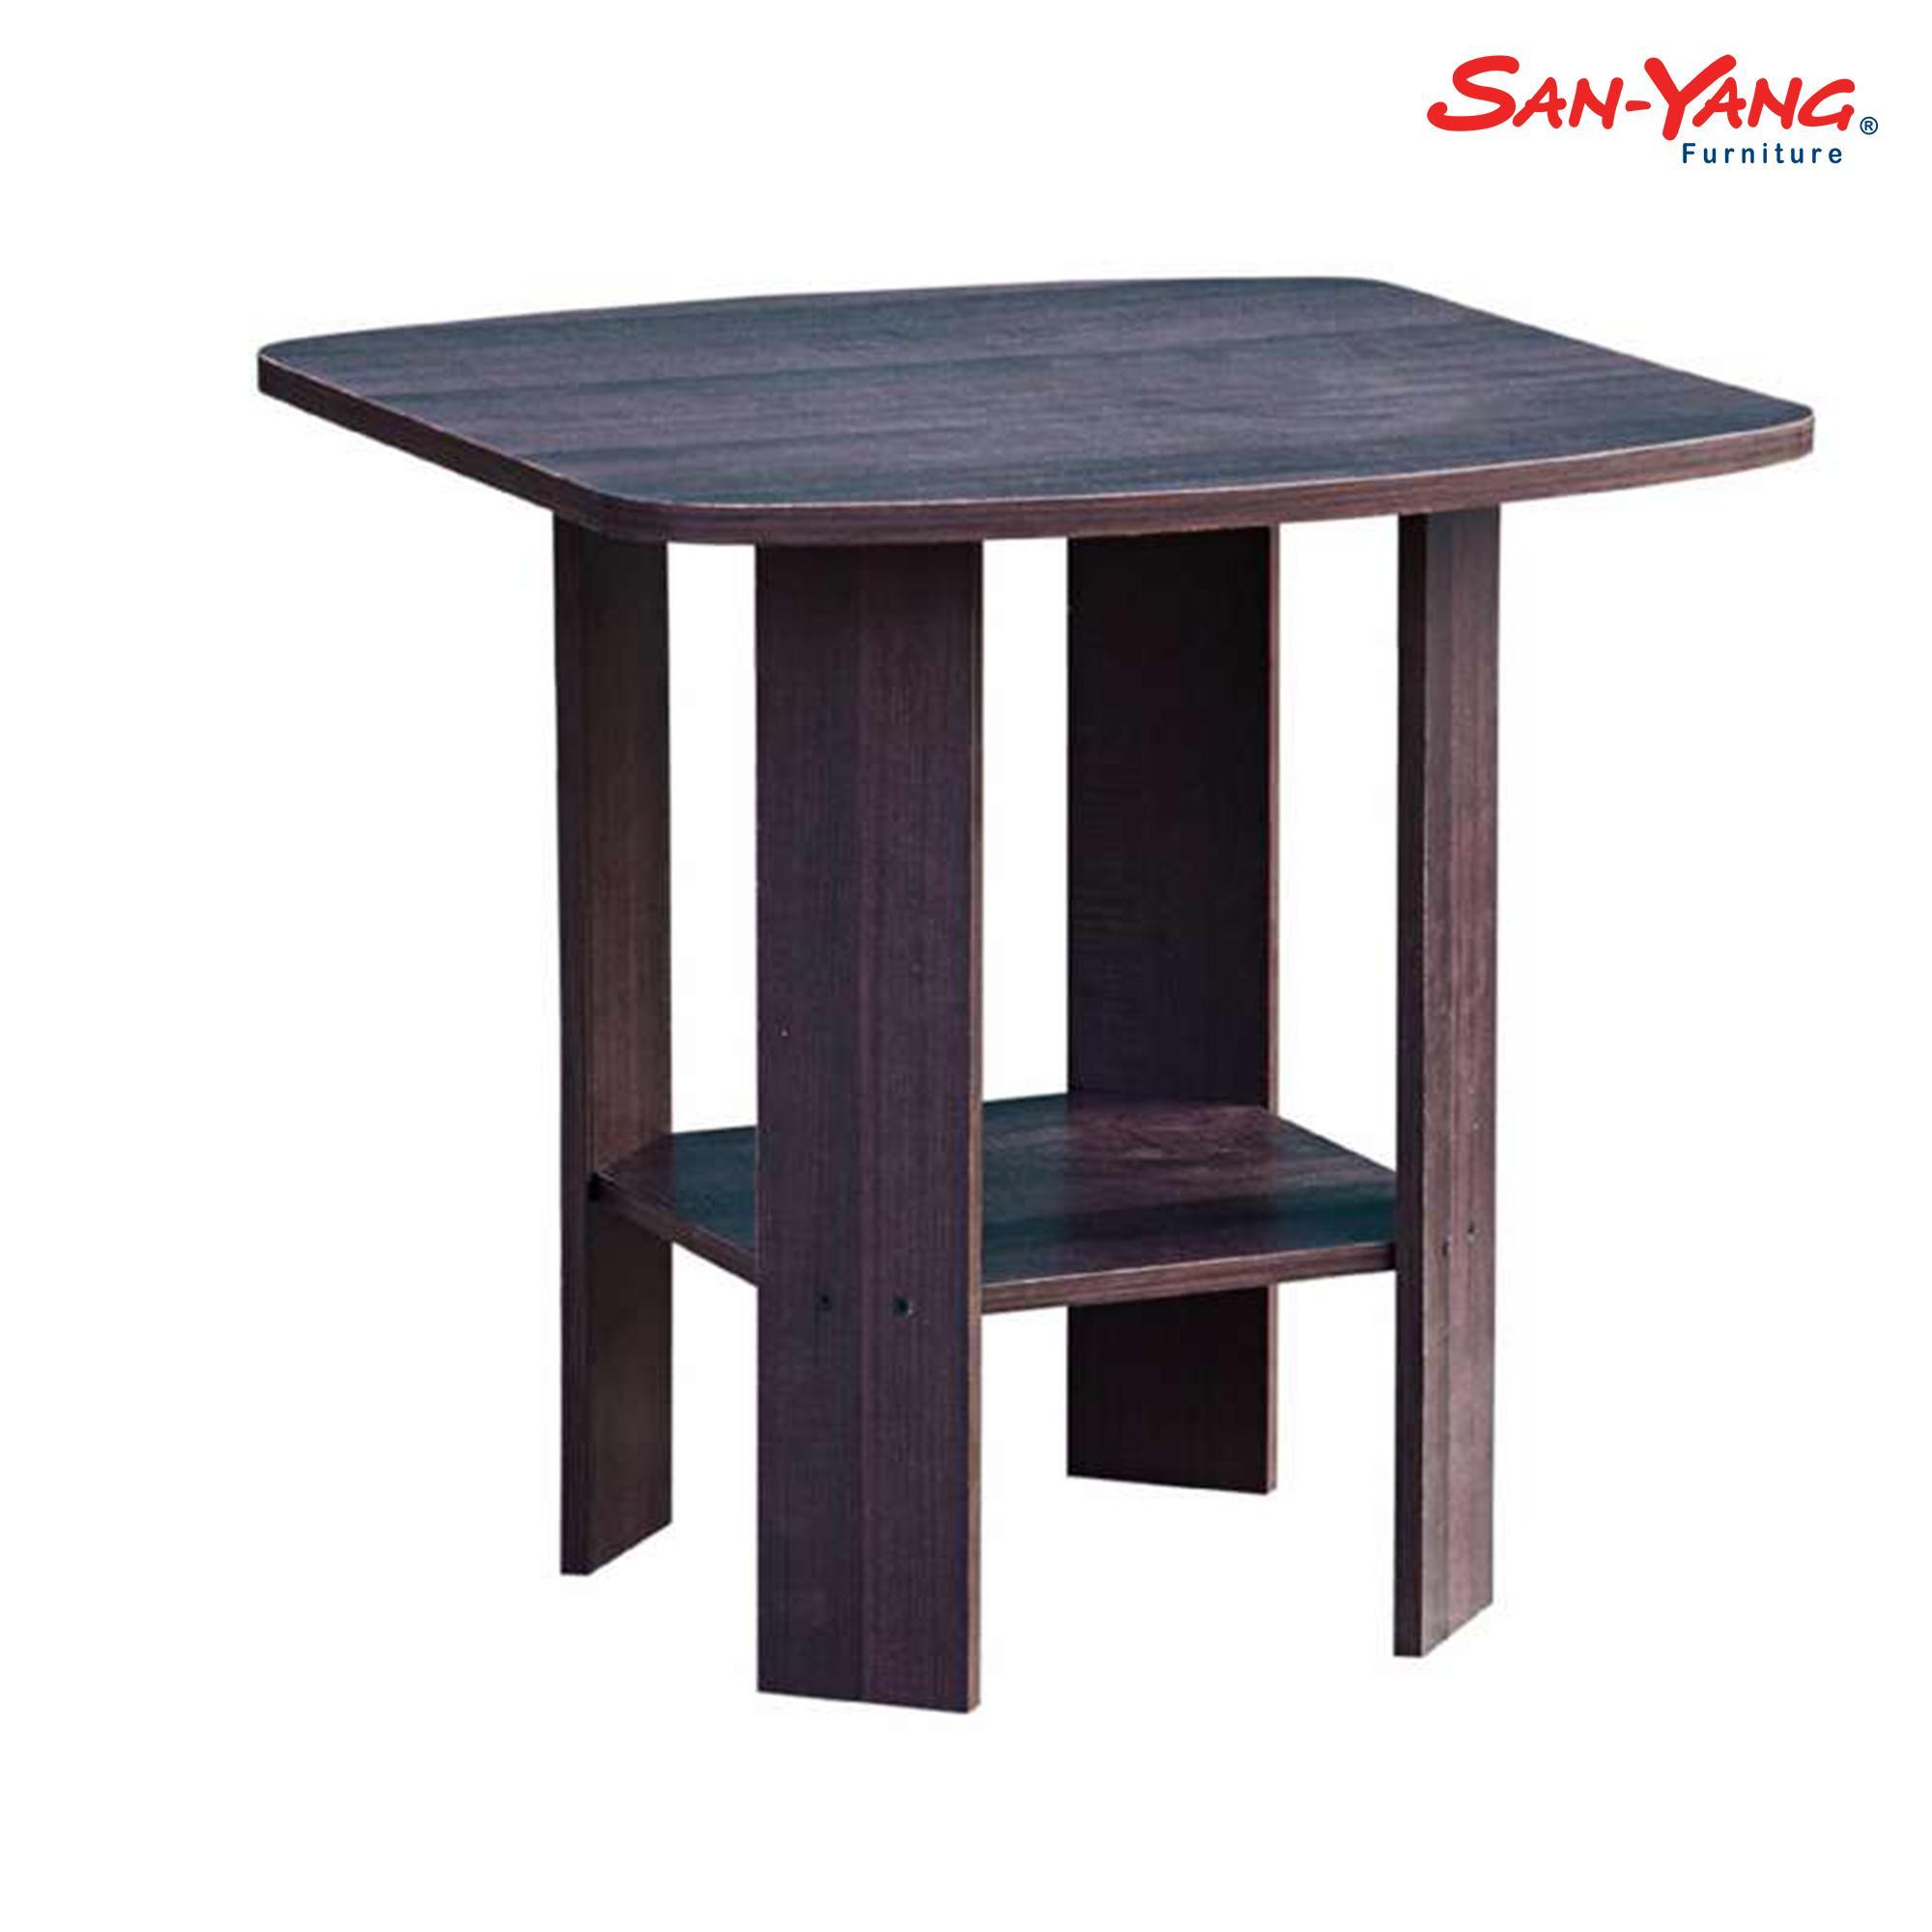 San-Yang Side Table Fst251 By San-Yang Furniture.